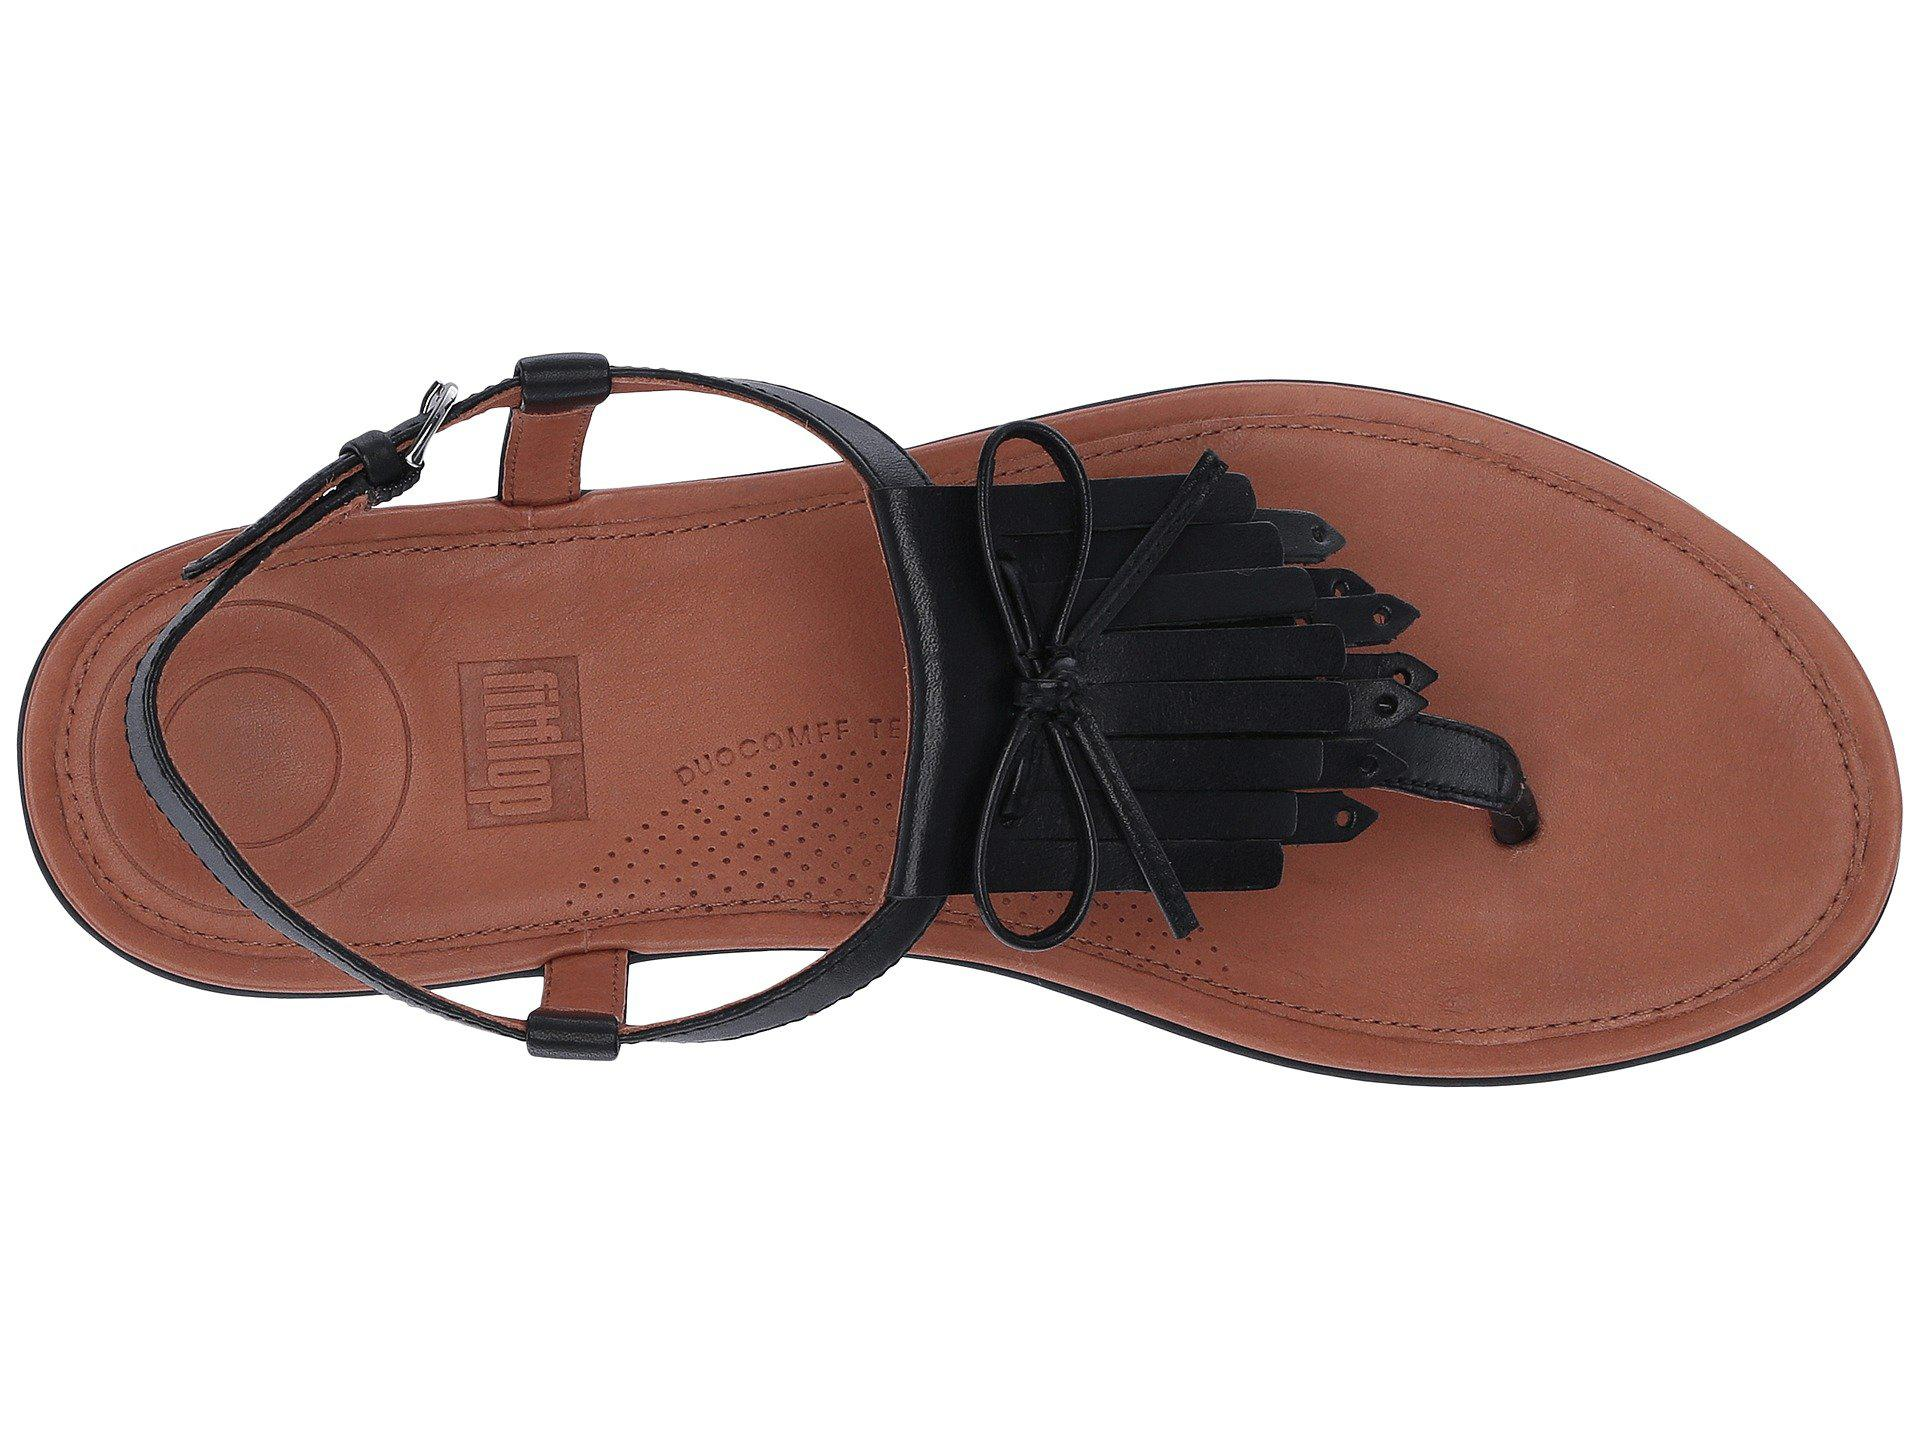 76fdff8cfb5371 Lyst - Fitflop Tia Fringe Toe Thong Sandal in Black